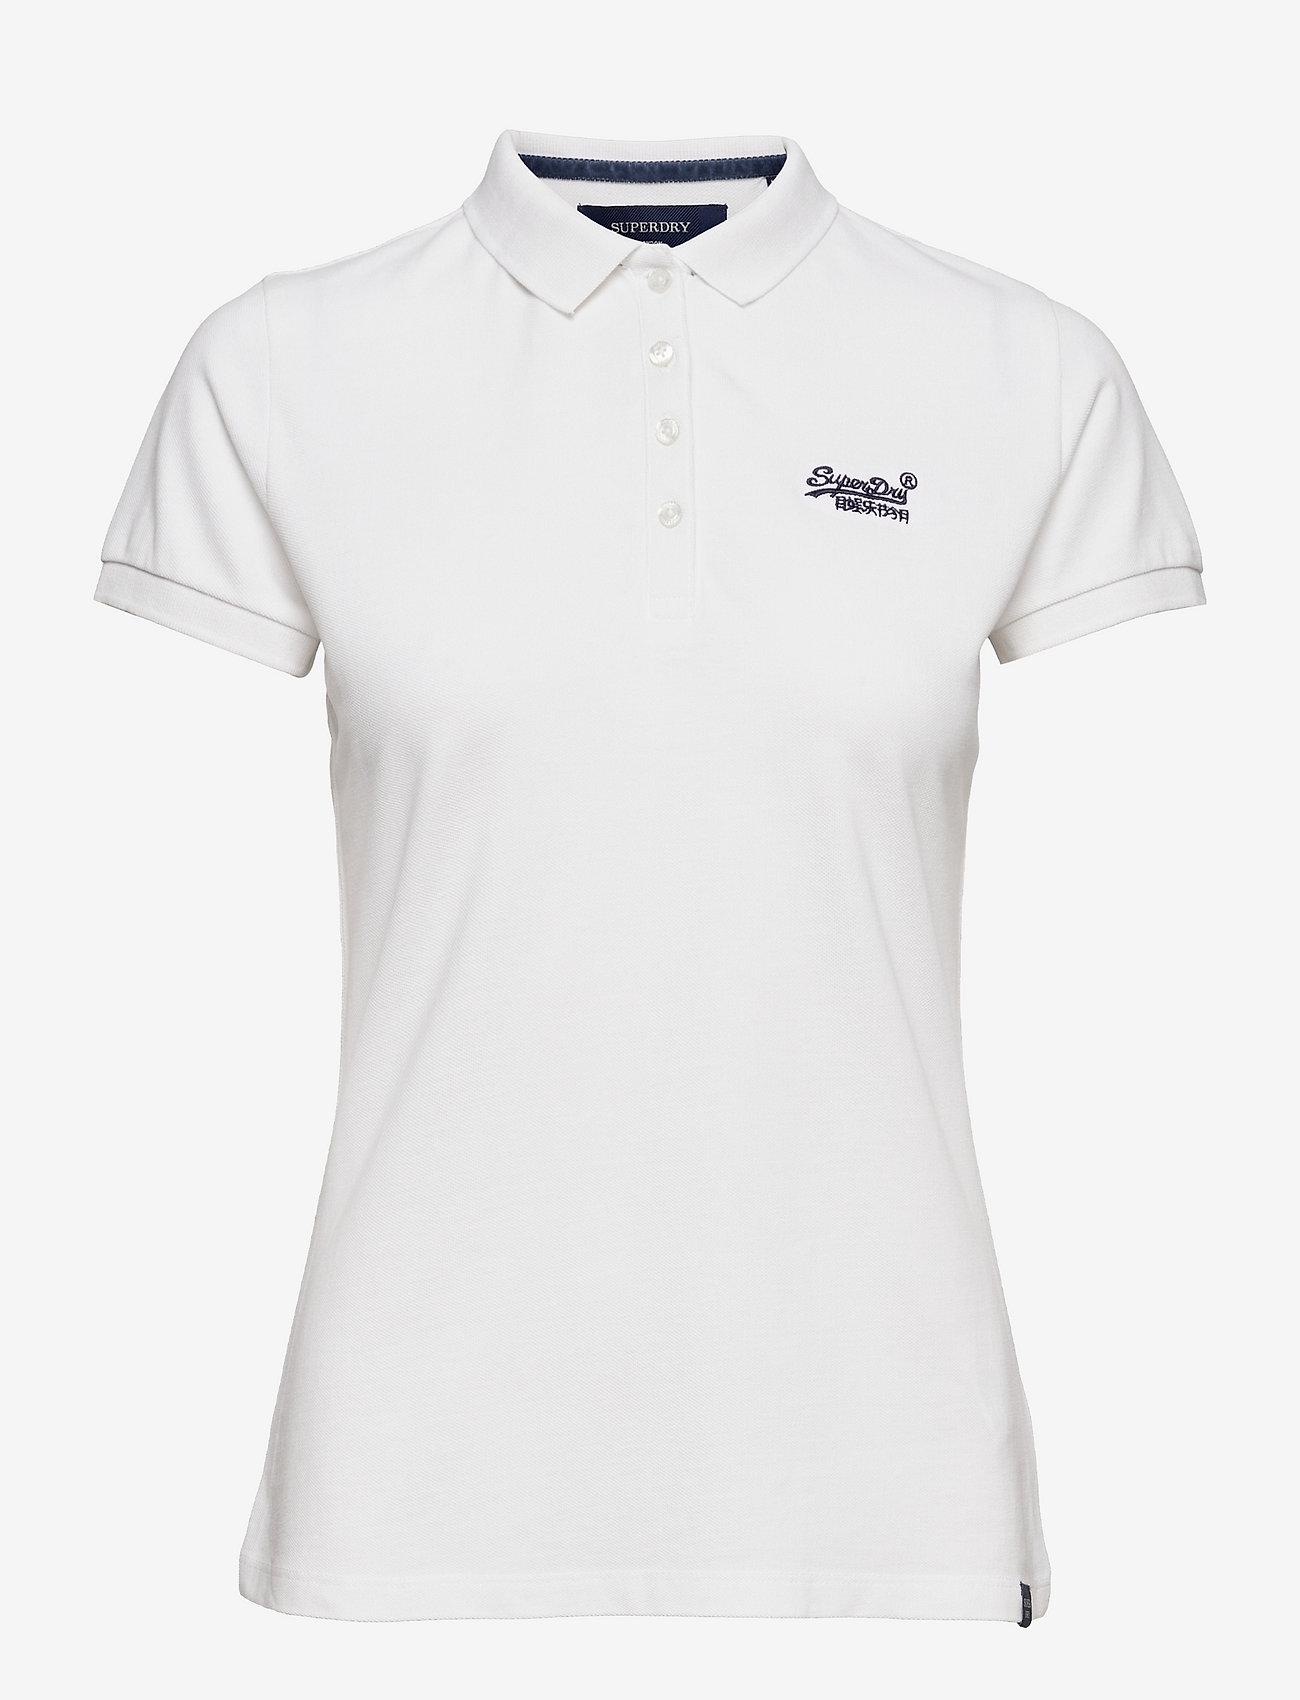 Superdry - POLO SHIRT - polo shirts - chalk white - 0